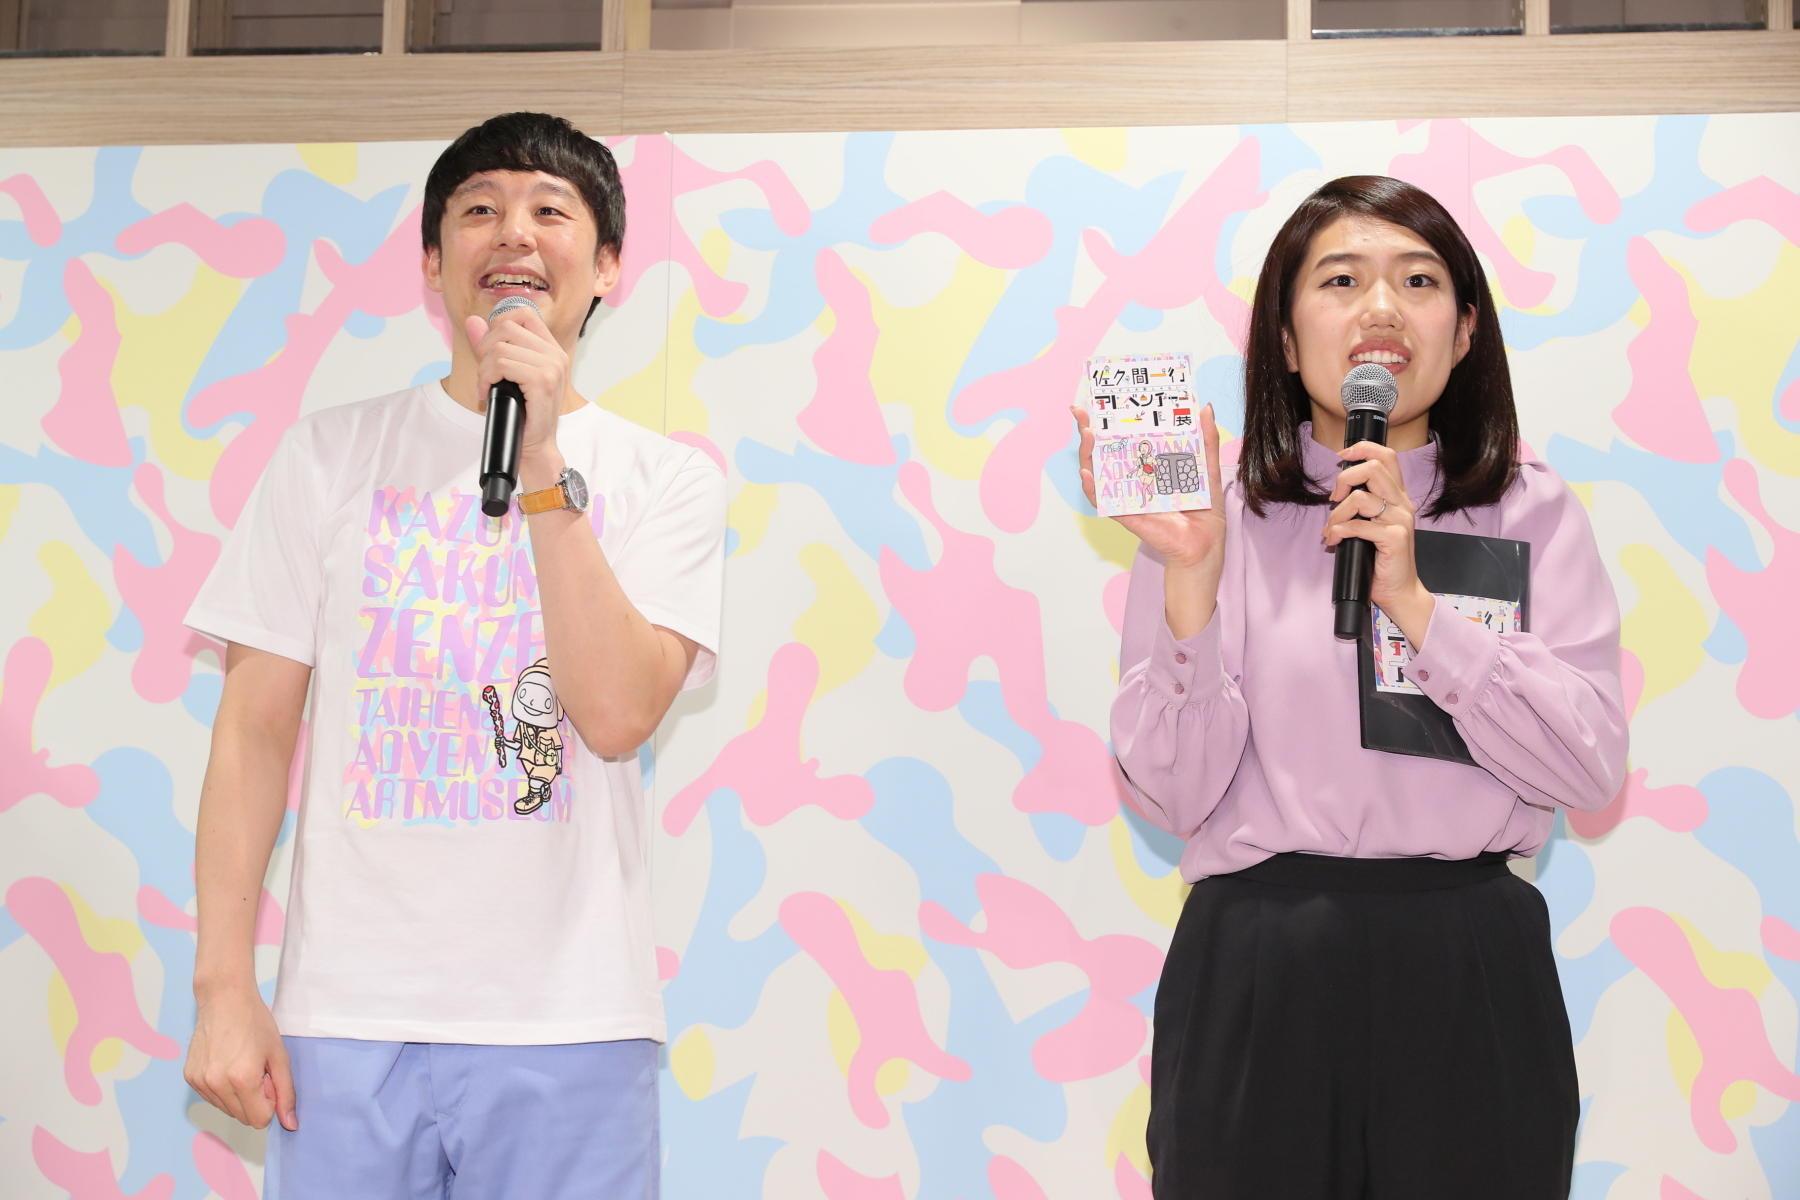 http://news.yoshimoto.co.jp/20180427002025-b1c2e6845979cf41473966aeeb9364ea5e5bb26b.jpg